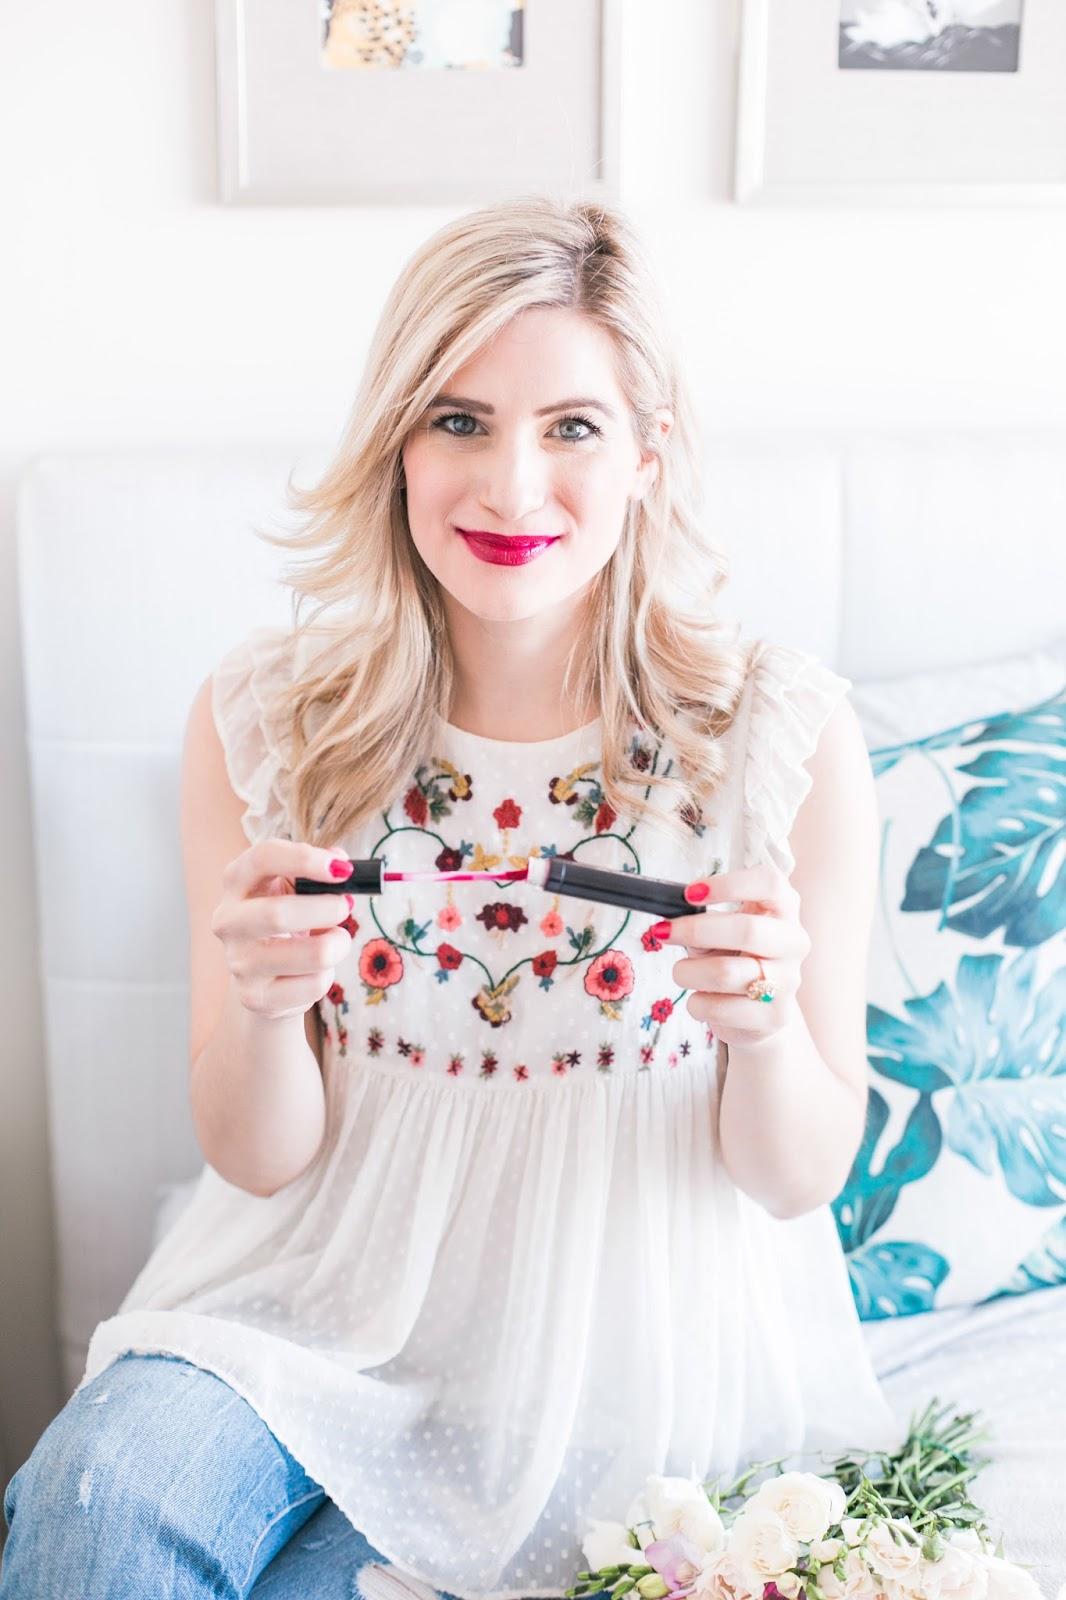 5 Pink Buxom Va-Va-PLUMP Shiny Liquid Lipsticks To Try This Spring - Wine Me Shade